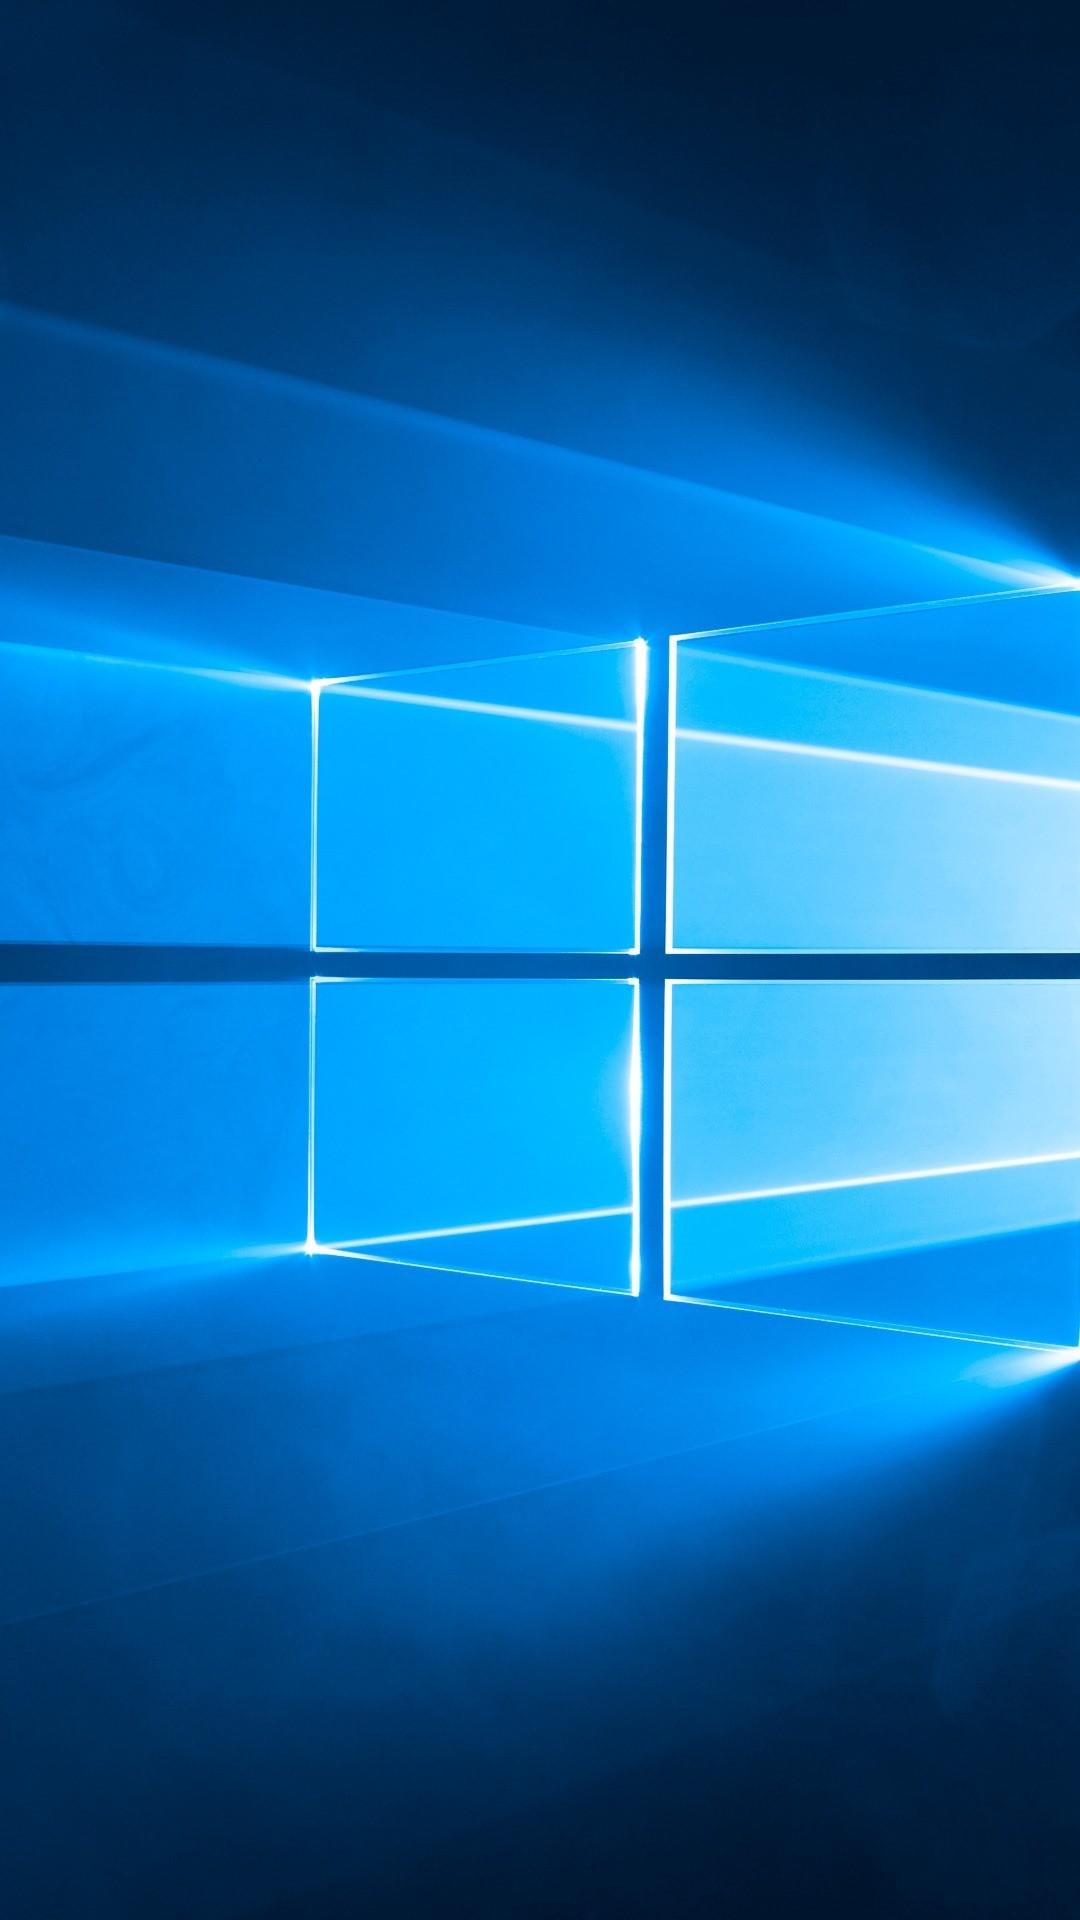 Gallery : Windows 10 Mobile Build 10162 wallpaper